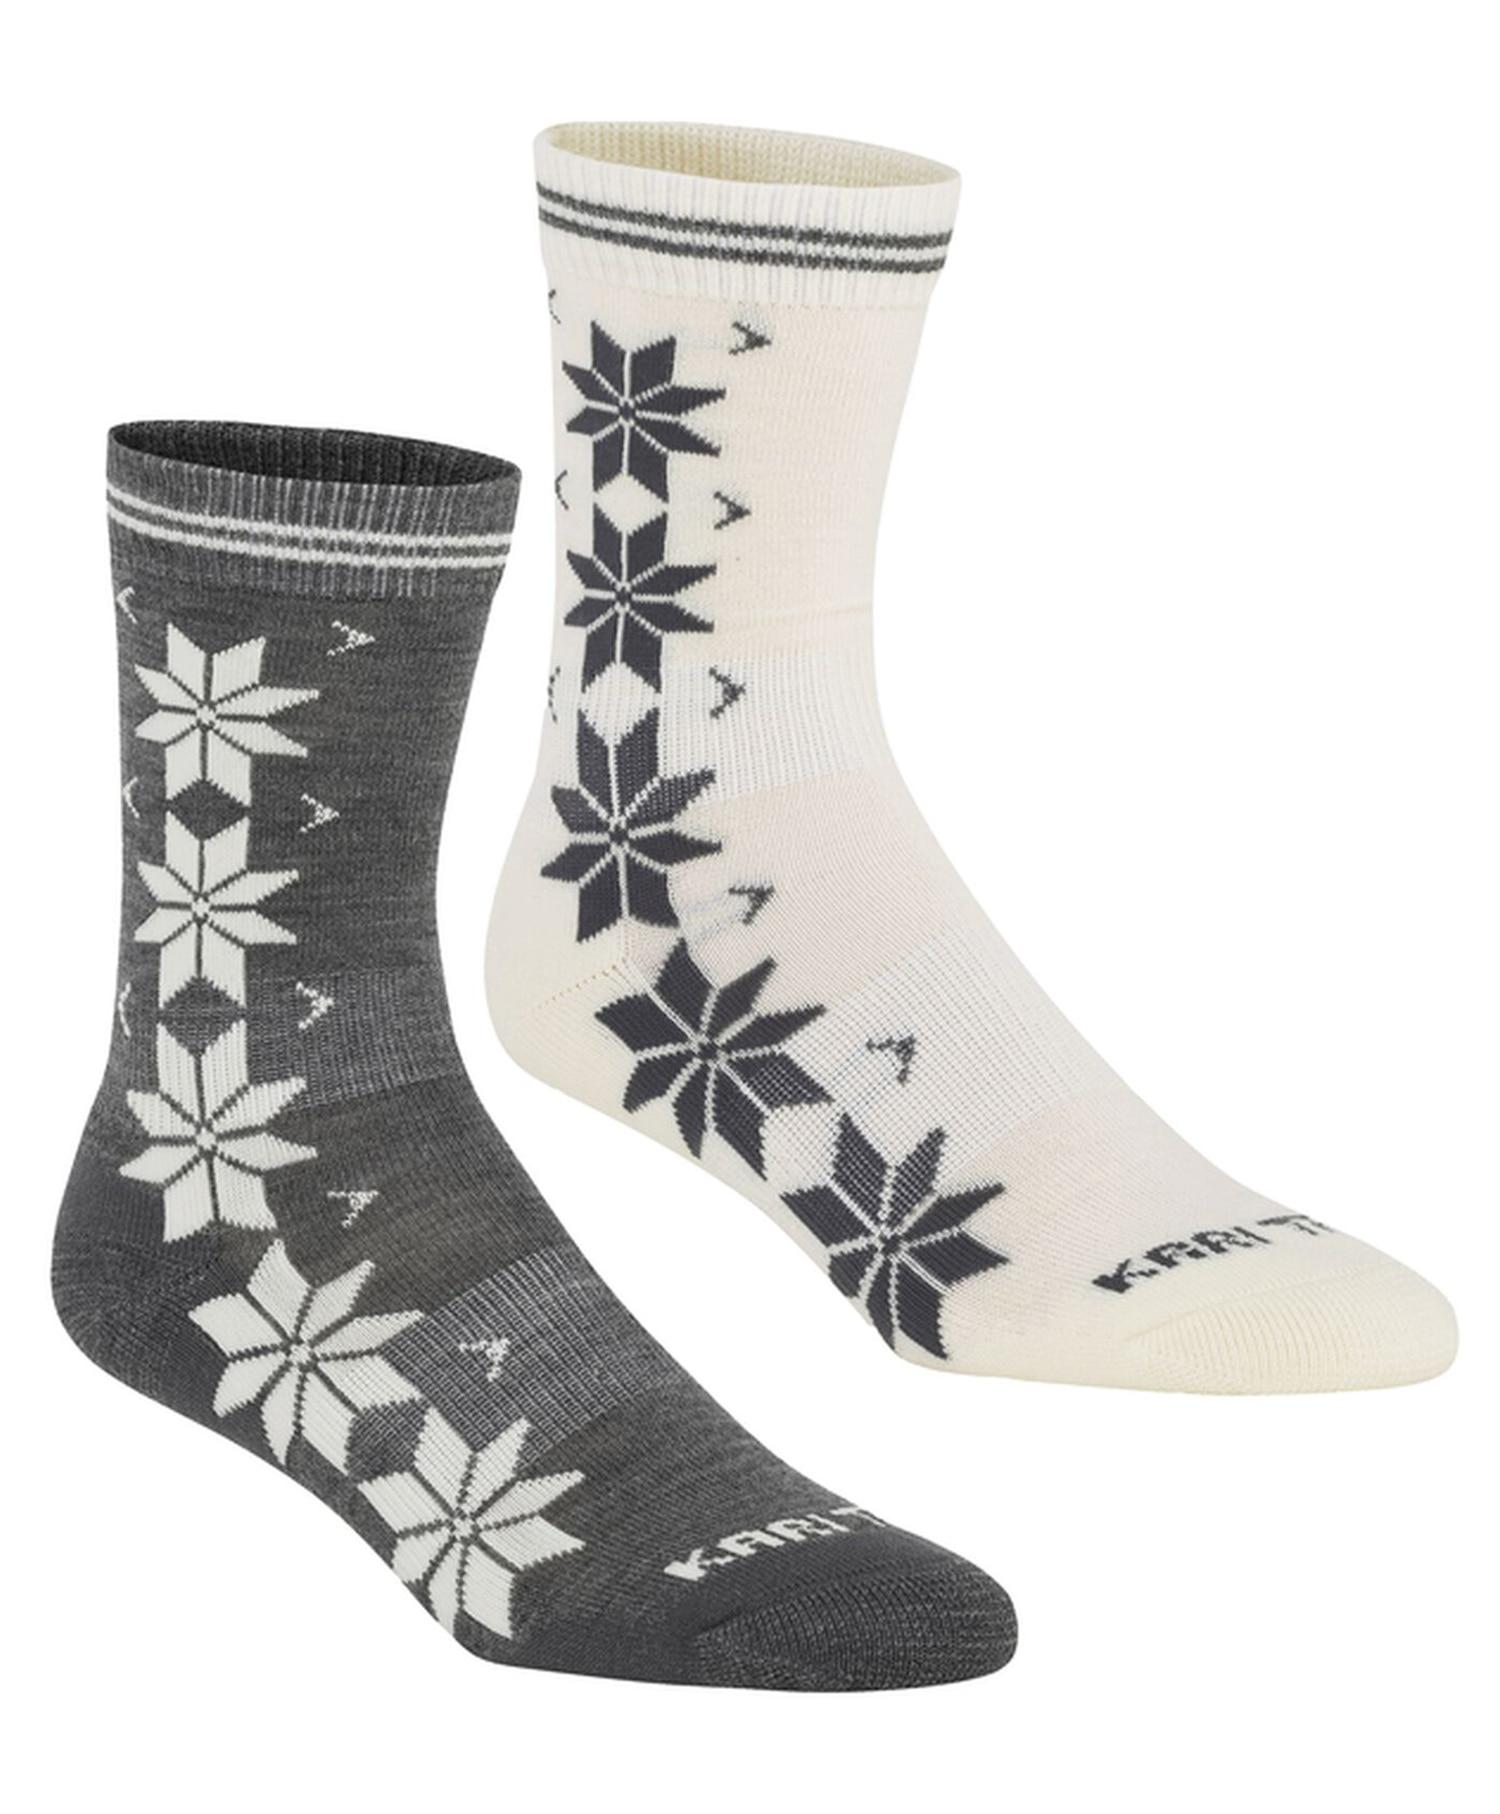 Kari Traa Vinst WOOL  sokk 2pk